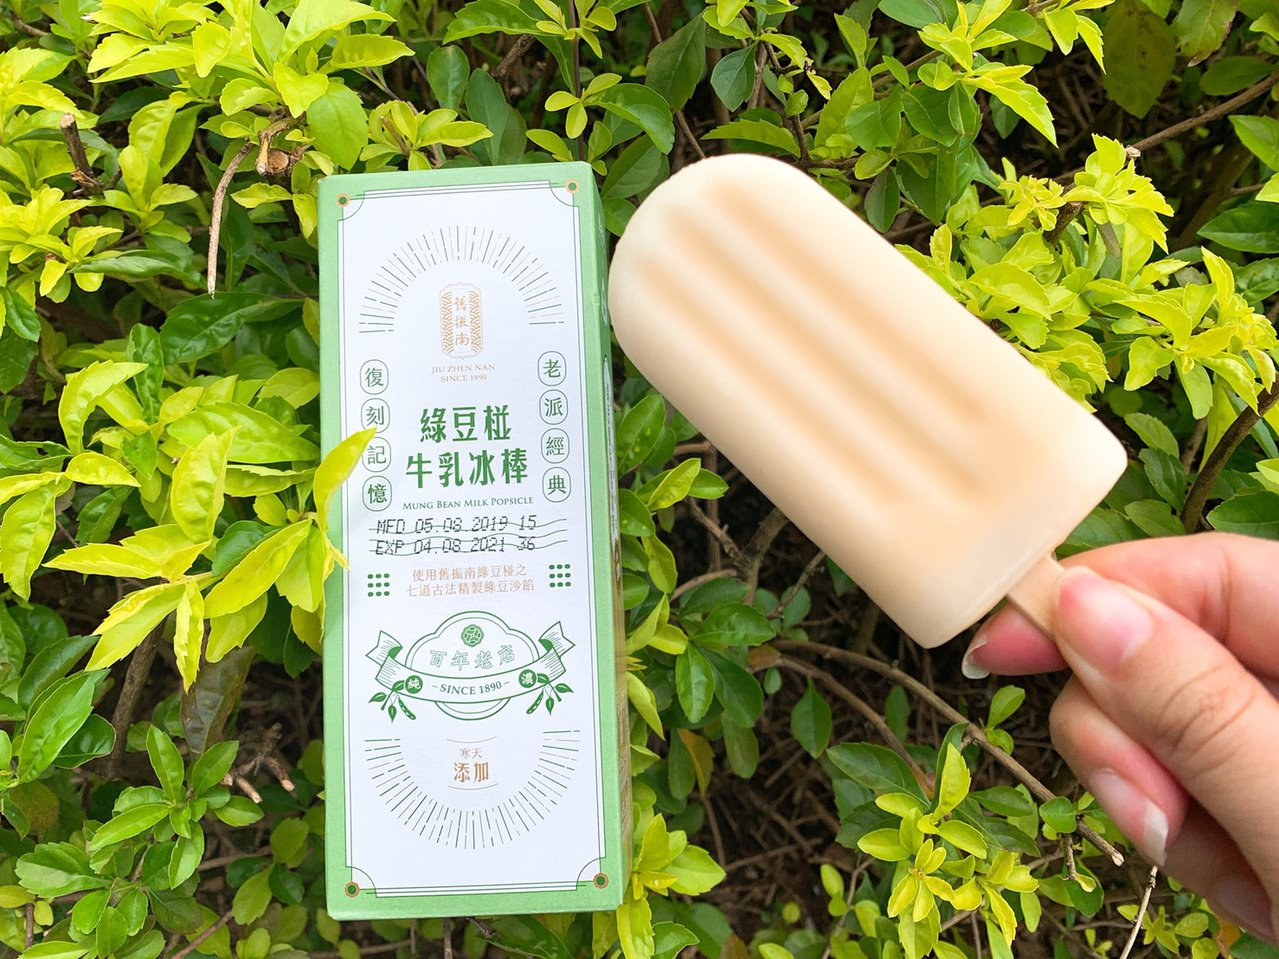 7-ELEVEN獨家推出百年老店舊振南、杜老爺創意聯名「綠豆椪牛乳冰棒」,售價4...